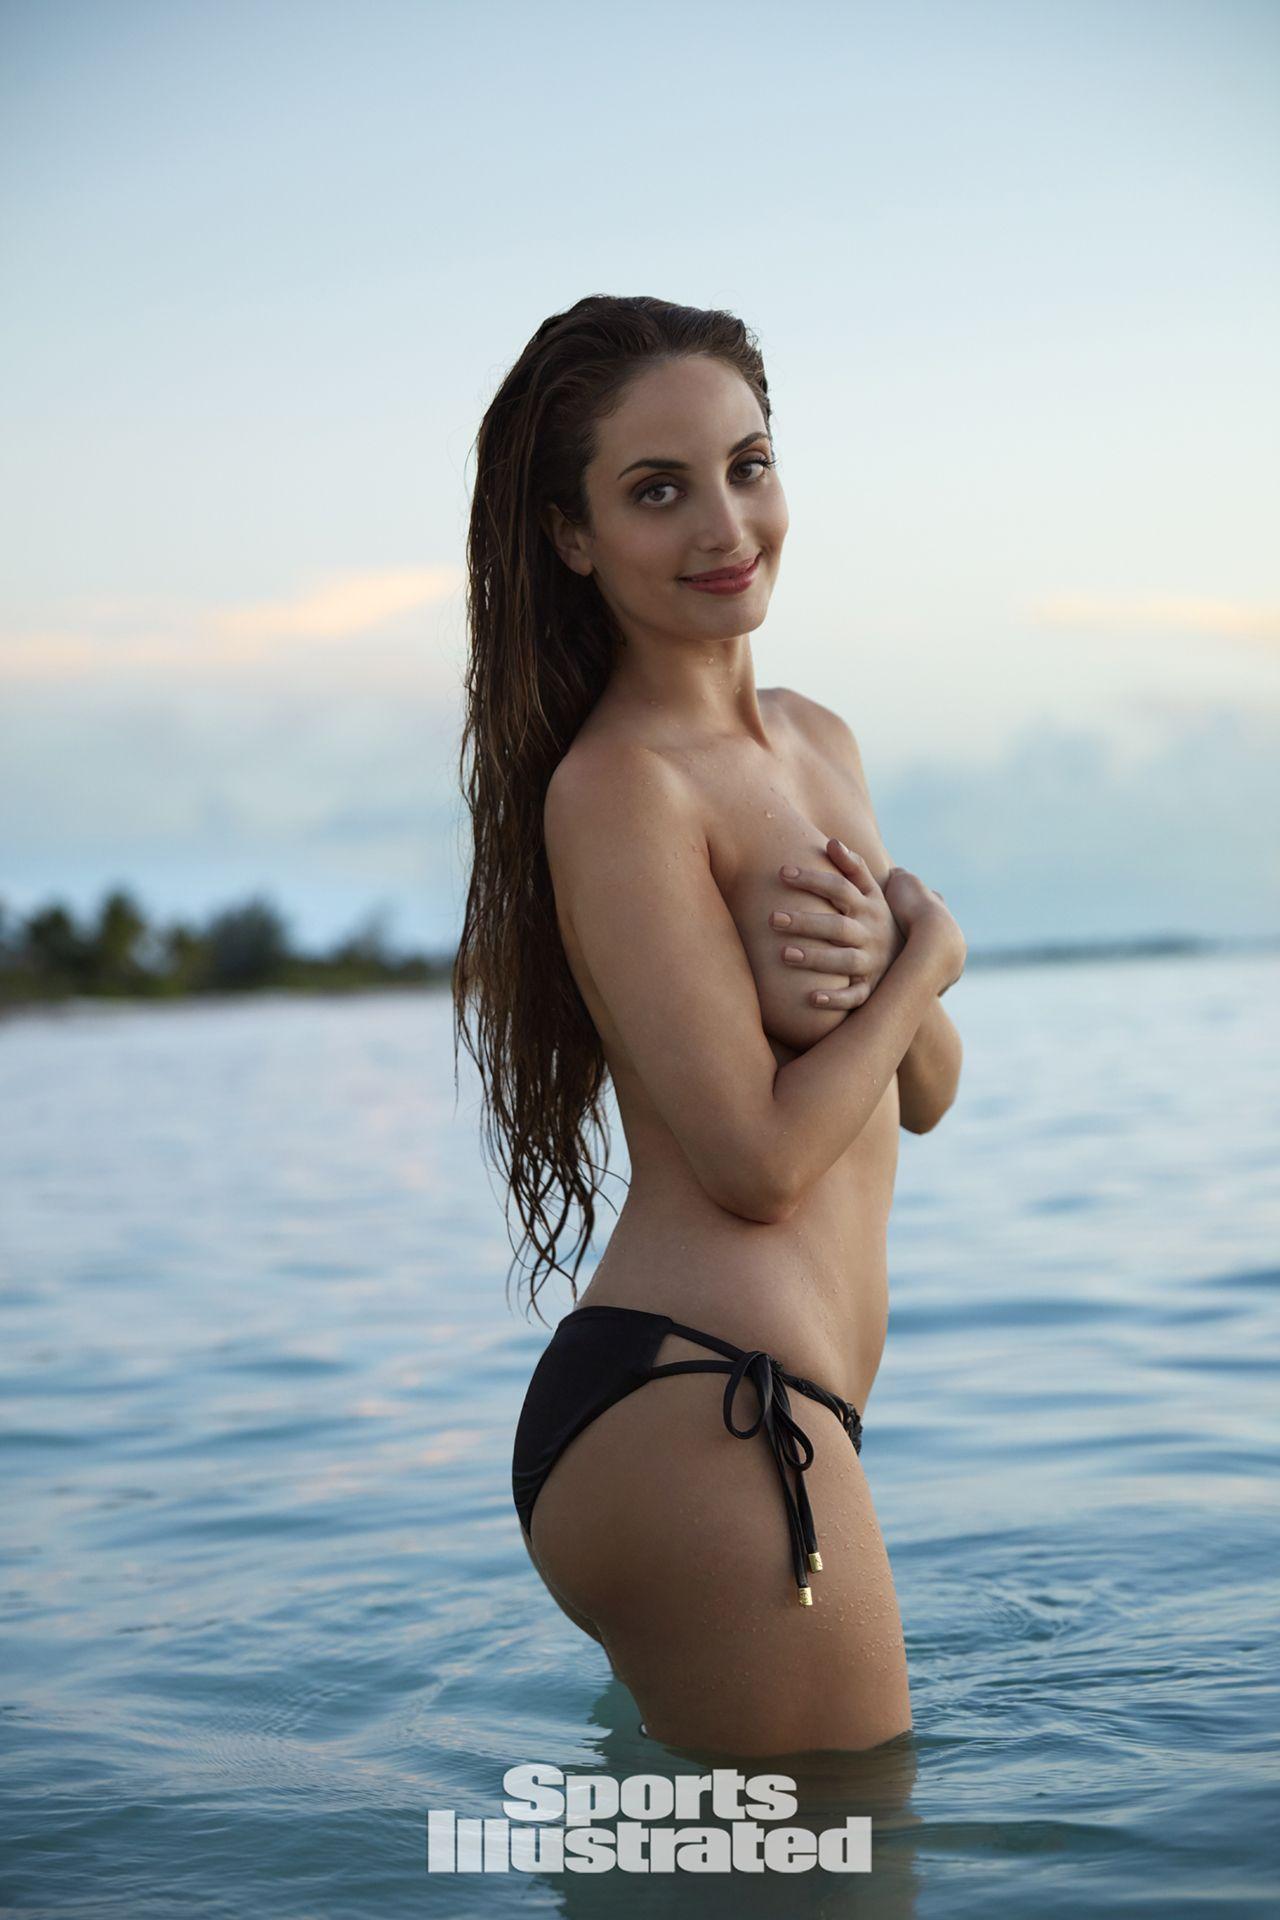 Alexa ray joel bikini